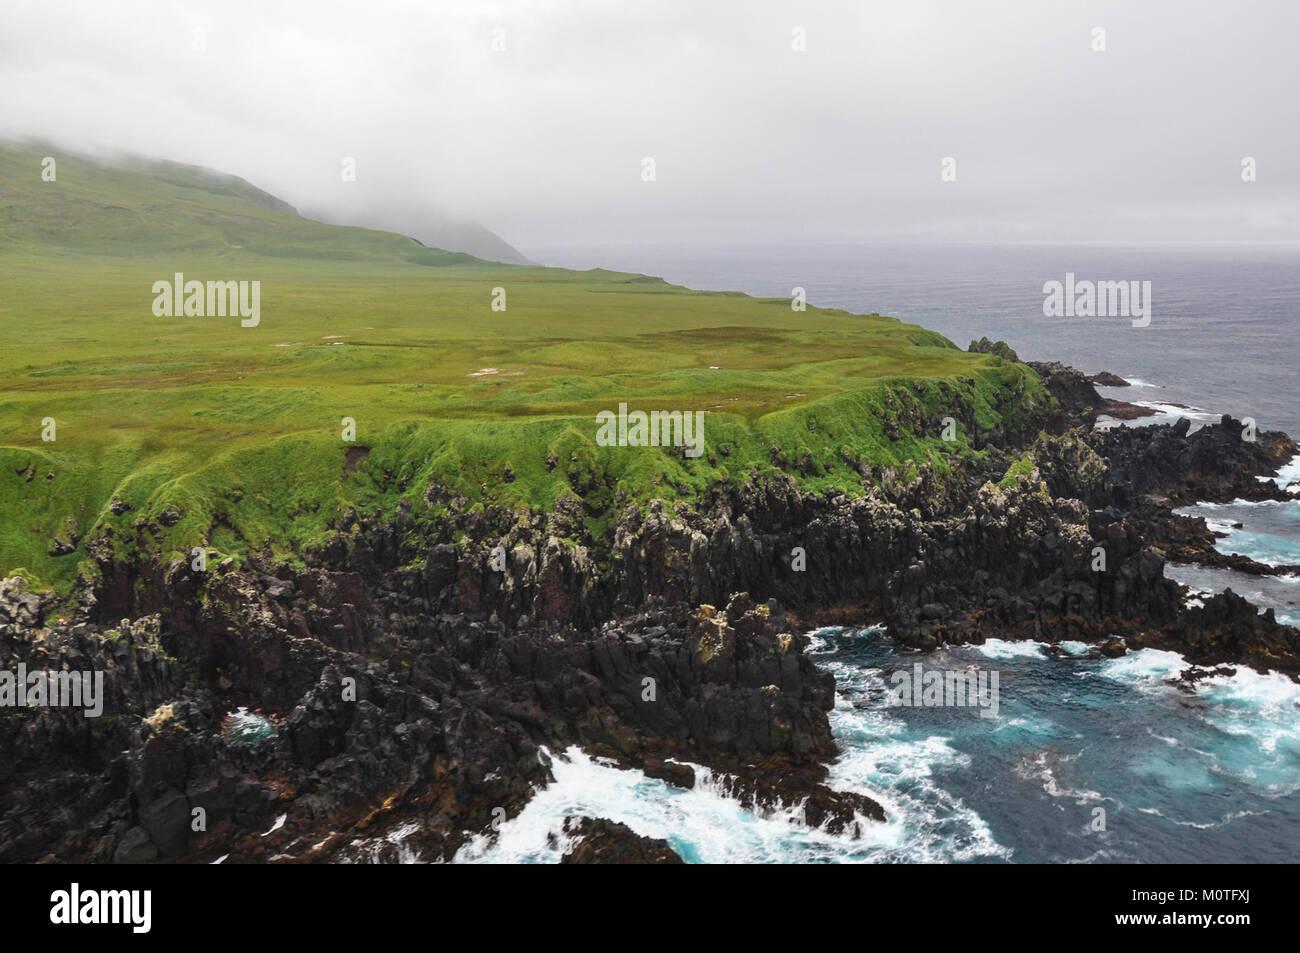 Carlisle Island, Alaska (17024890179) - Stock Image